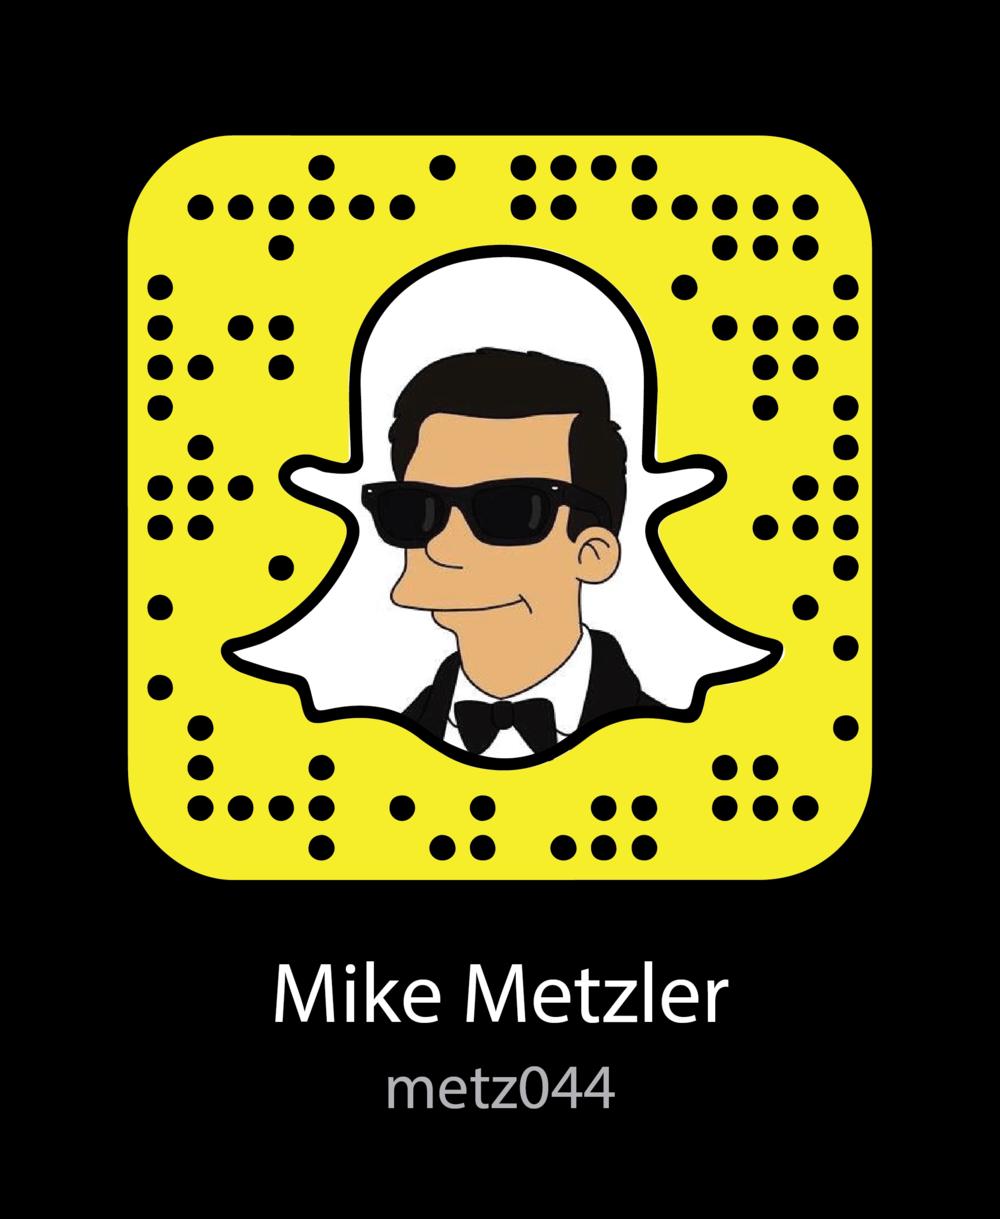 mike-metzler-metz044-artists-snapchat-snapcode